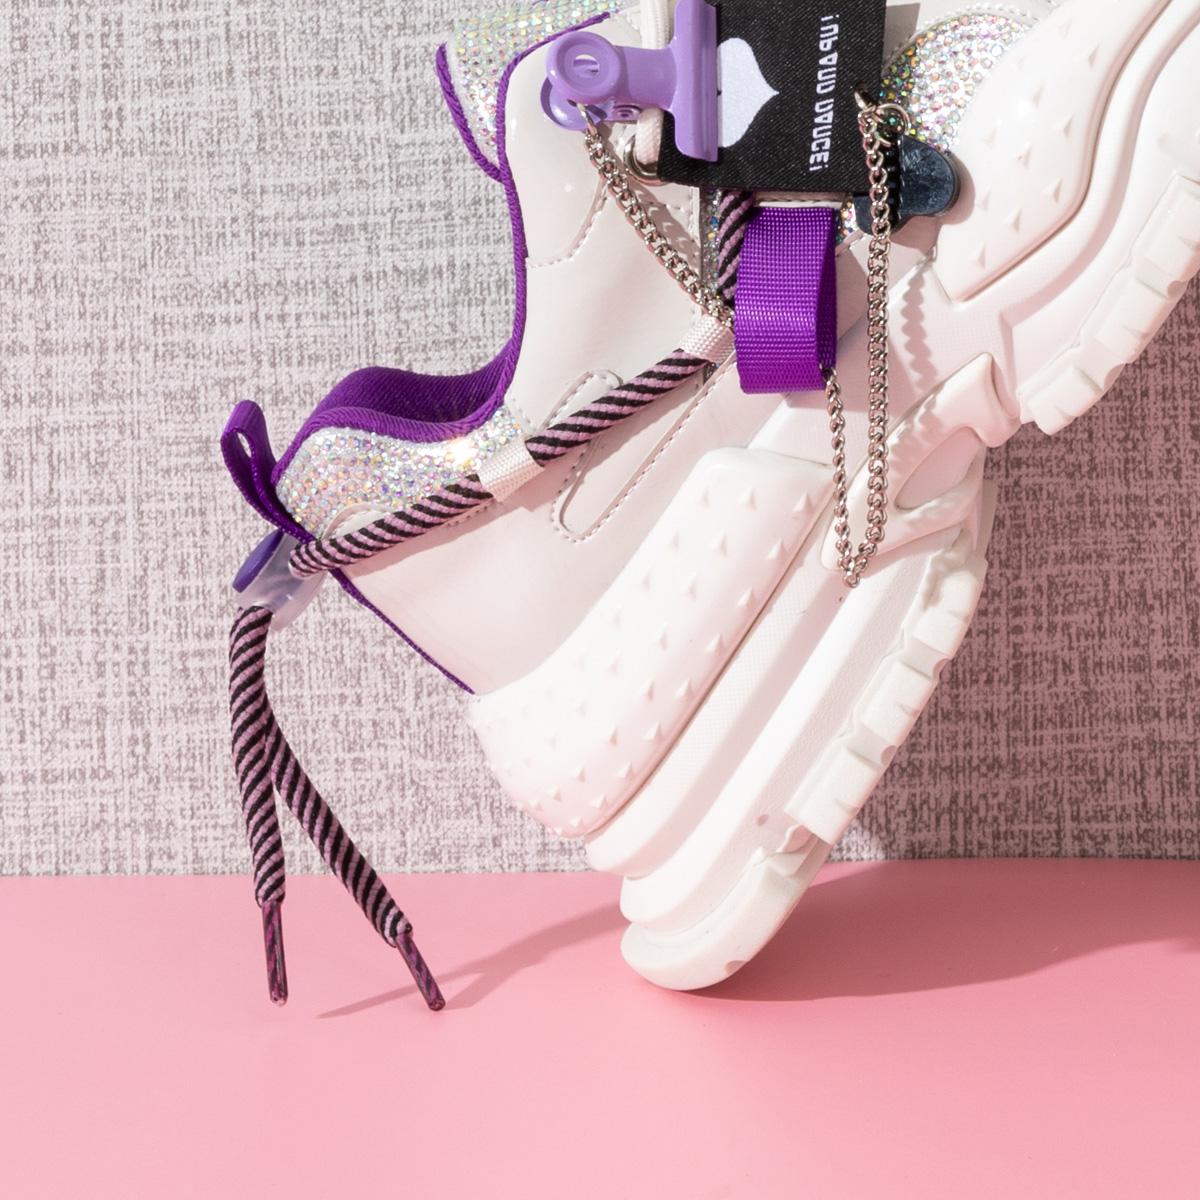 SS13112389 秋季新款圆头厚底拼色运动机甲鞋女鞋 2021 星期六老爹鞋